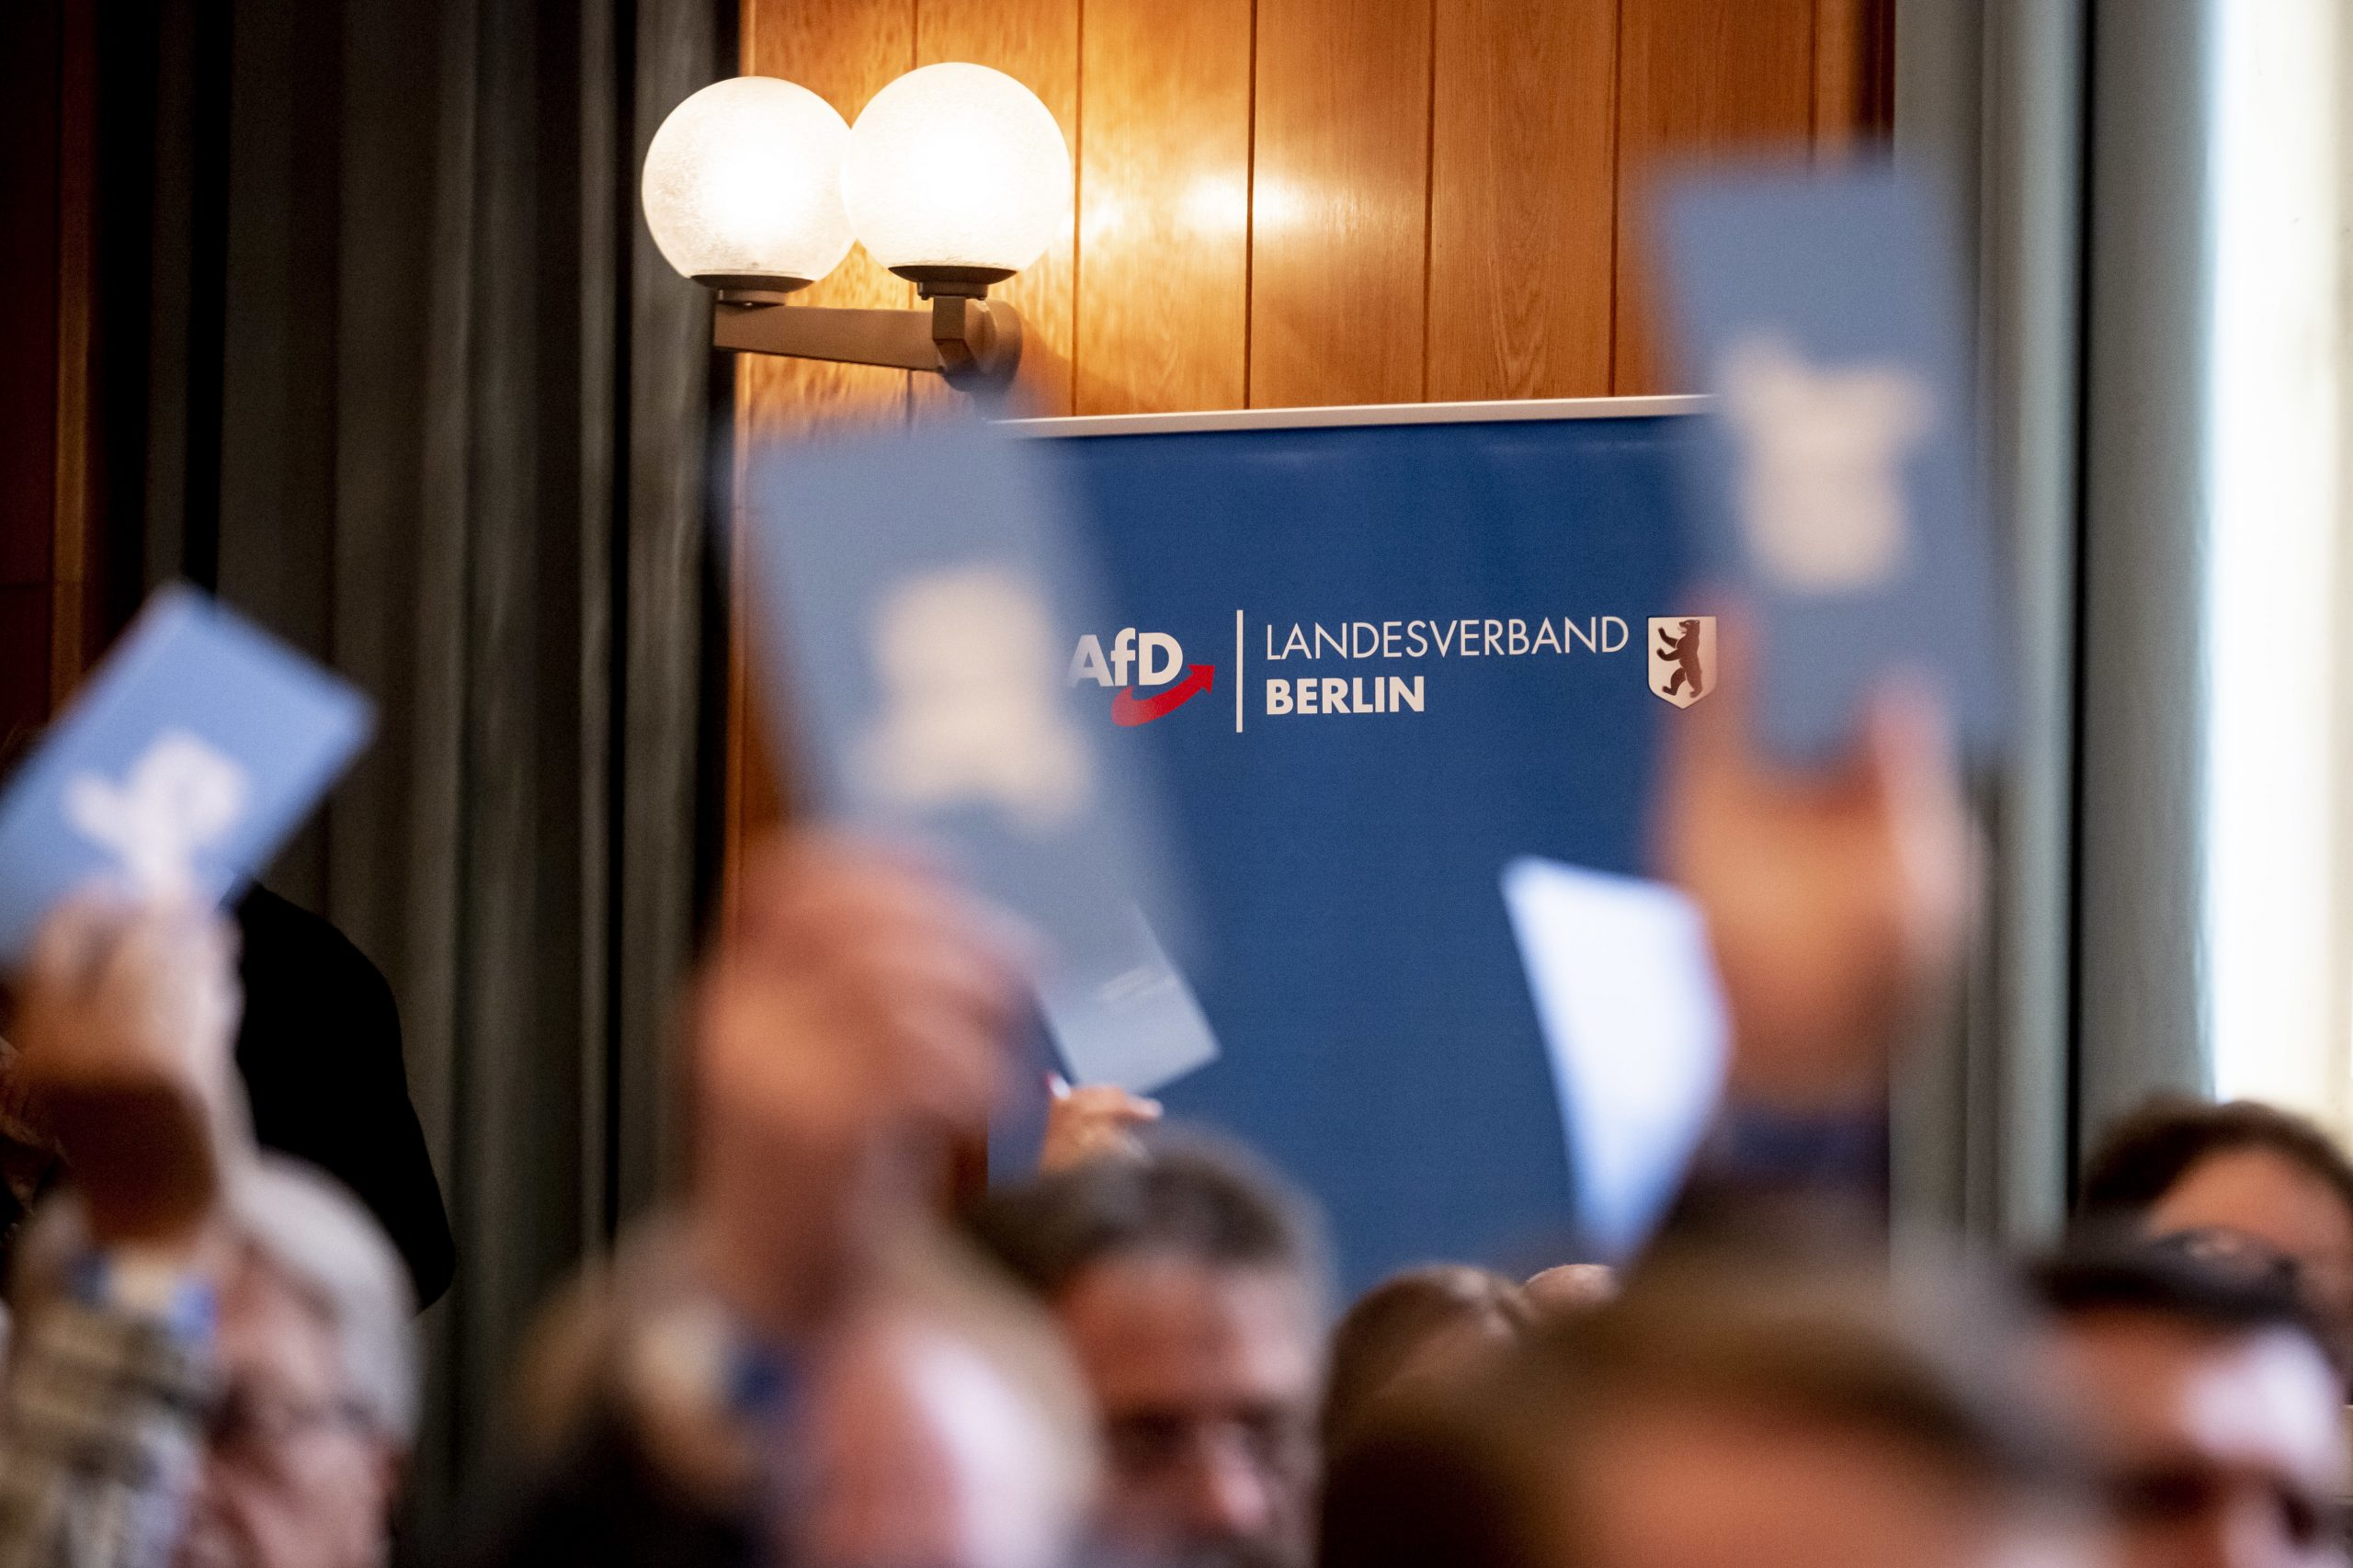 Parteitag der AfD Berlin 2019 Foto: picture alliance/Christoph Soeder/dpa